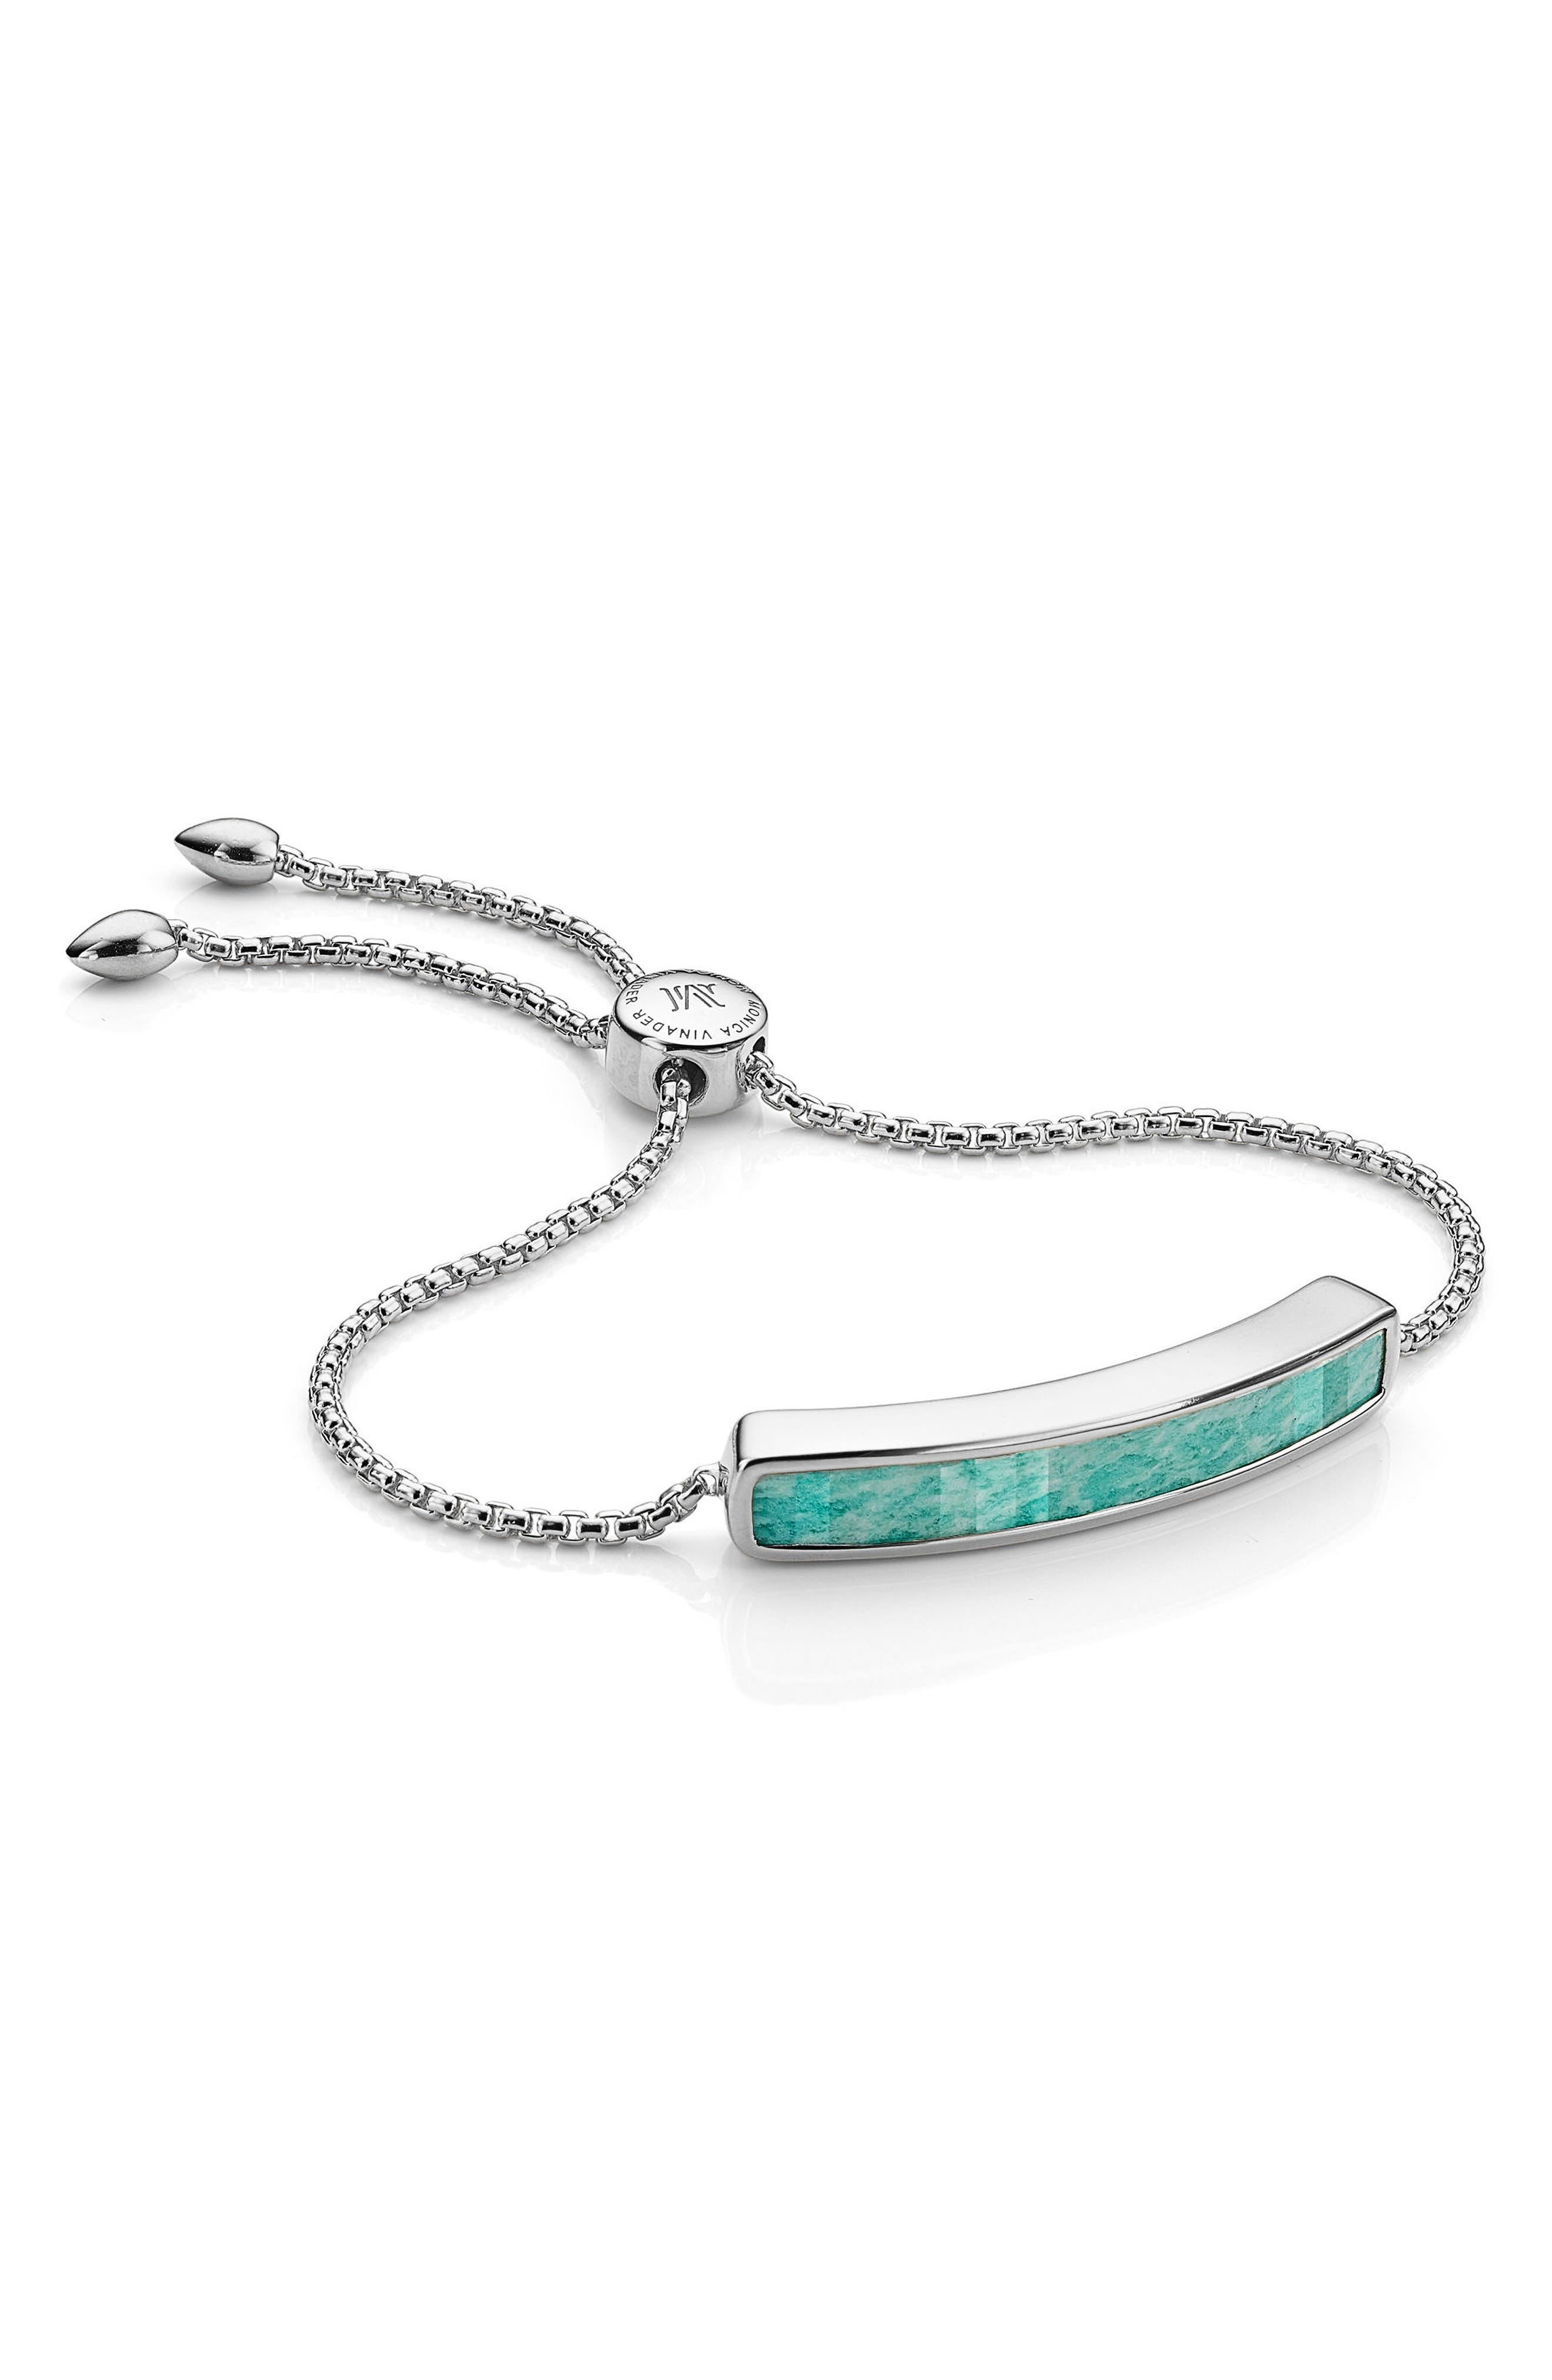 Baja Sterling Stone Bracelet,                             Main thumbnail 1, color,                             Silver/ Amazonite